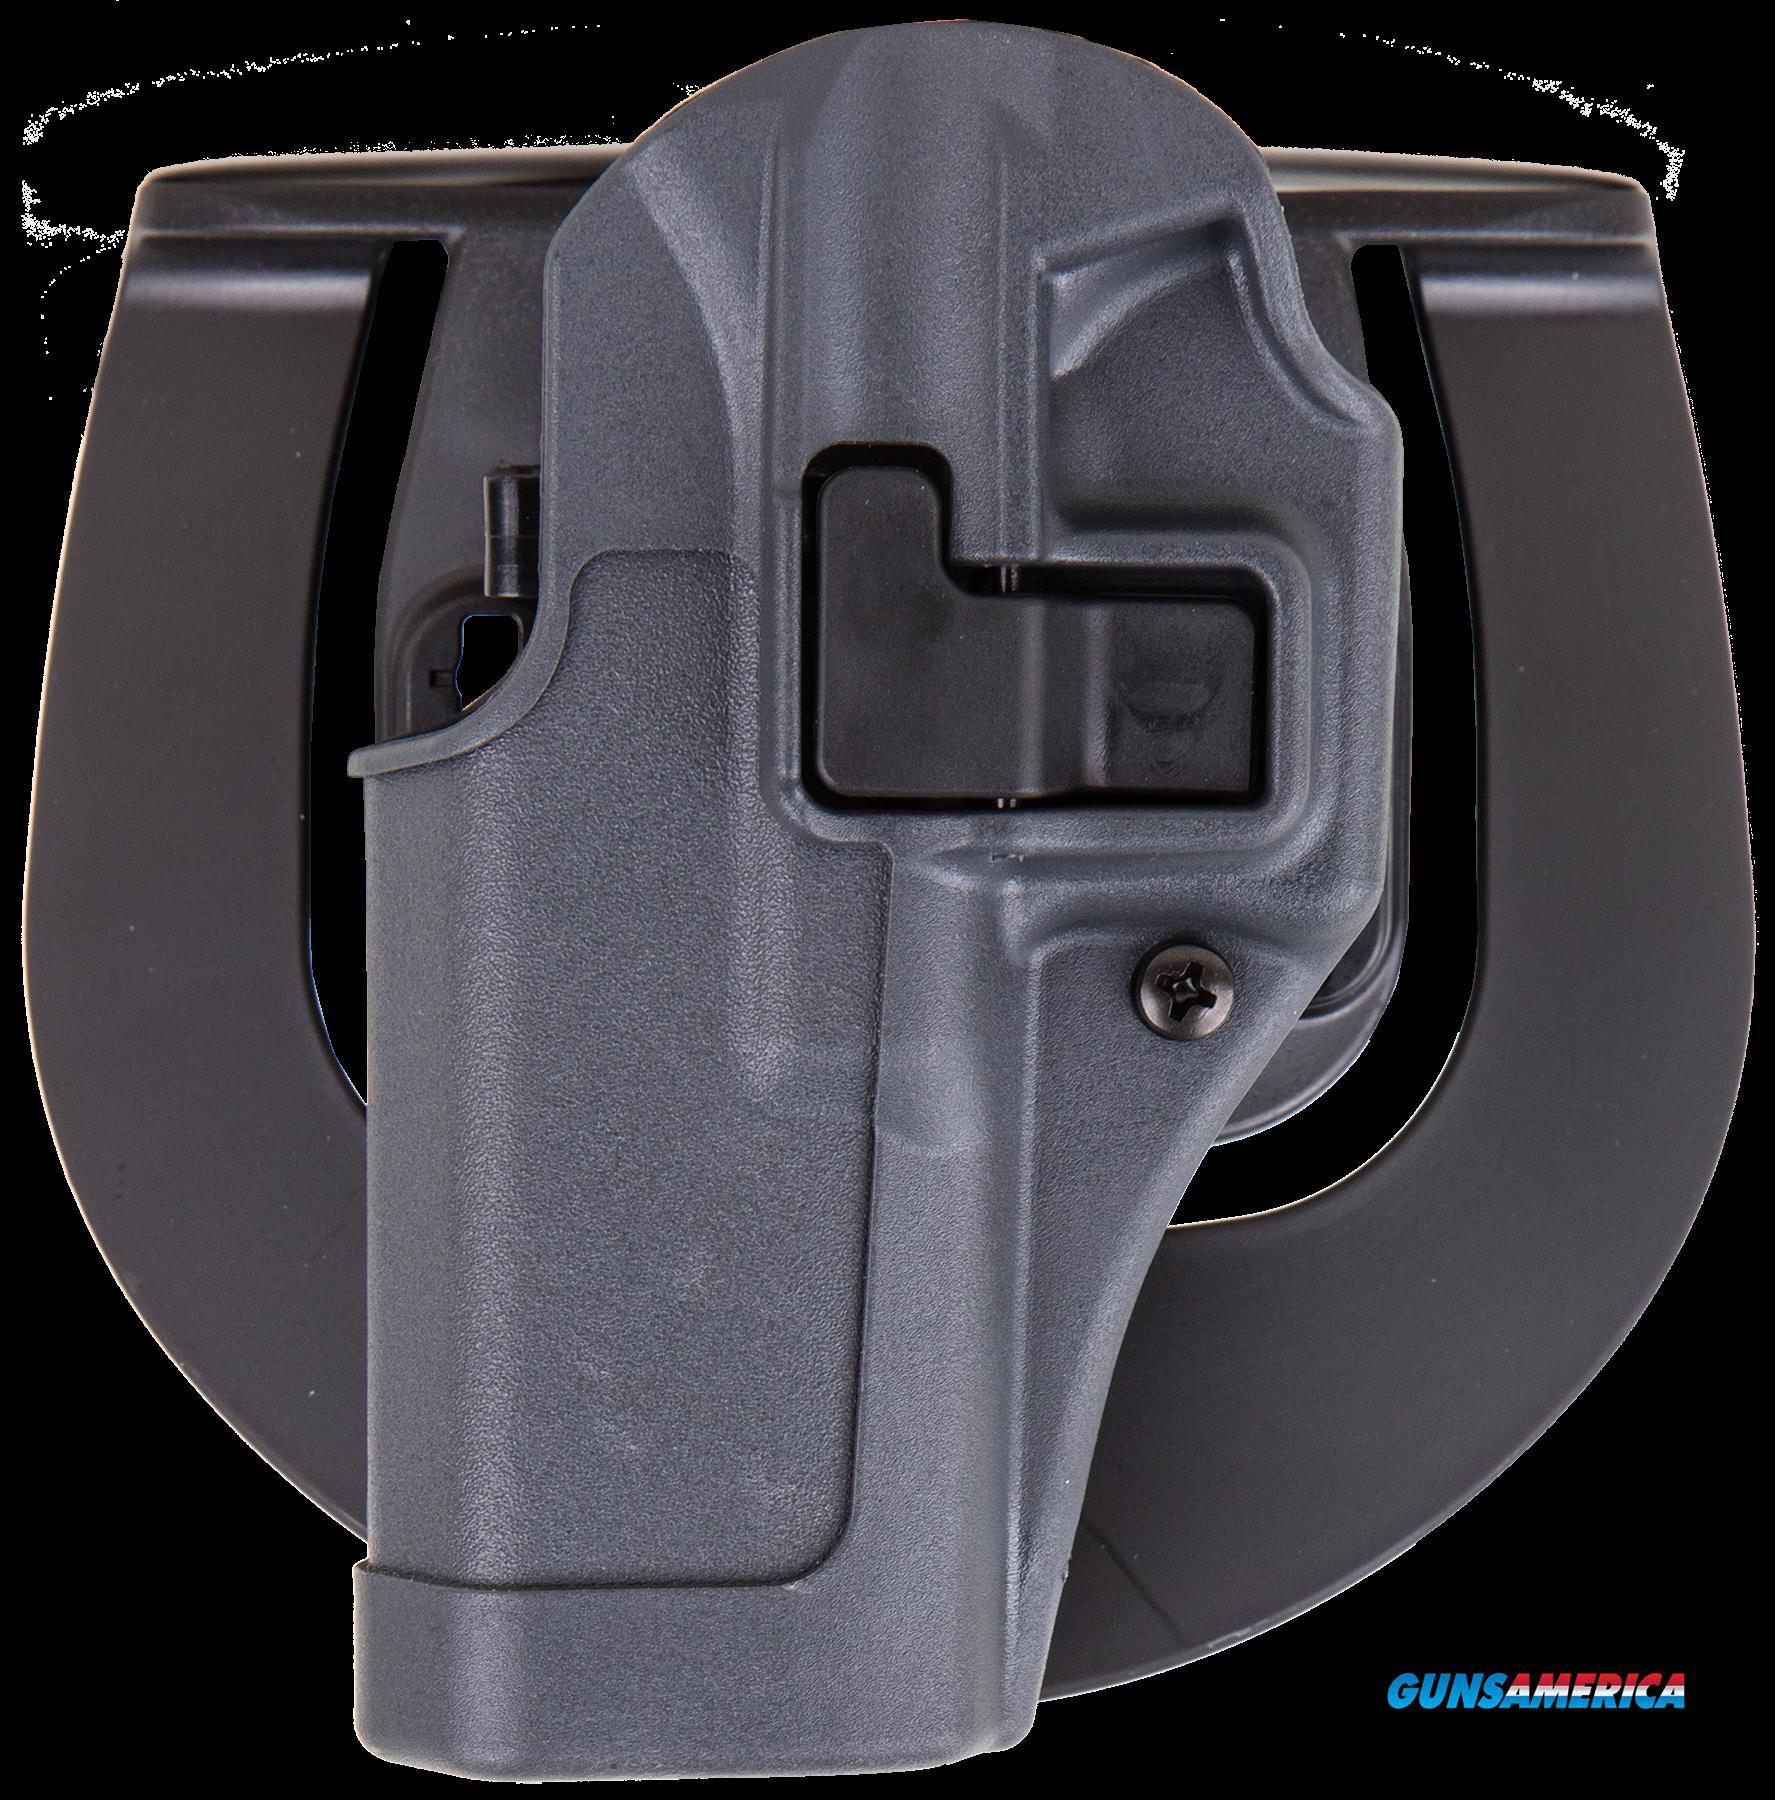 Blackhawk Serpa, Bhwk 413525bkl Sportster S&w M&p  Guns > Pistols > 1911 Pistol Copies (non-Colt)